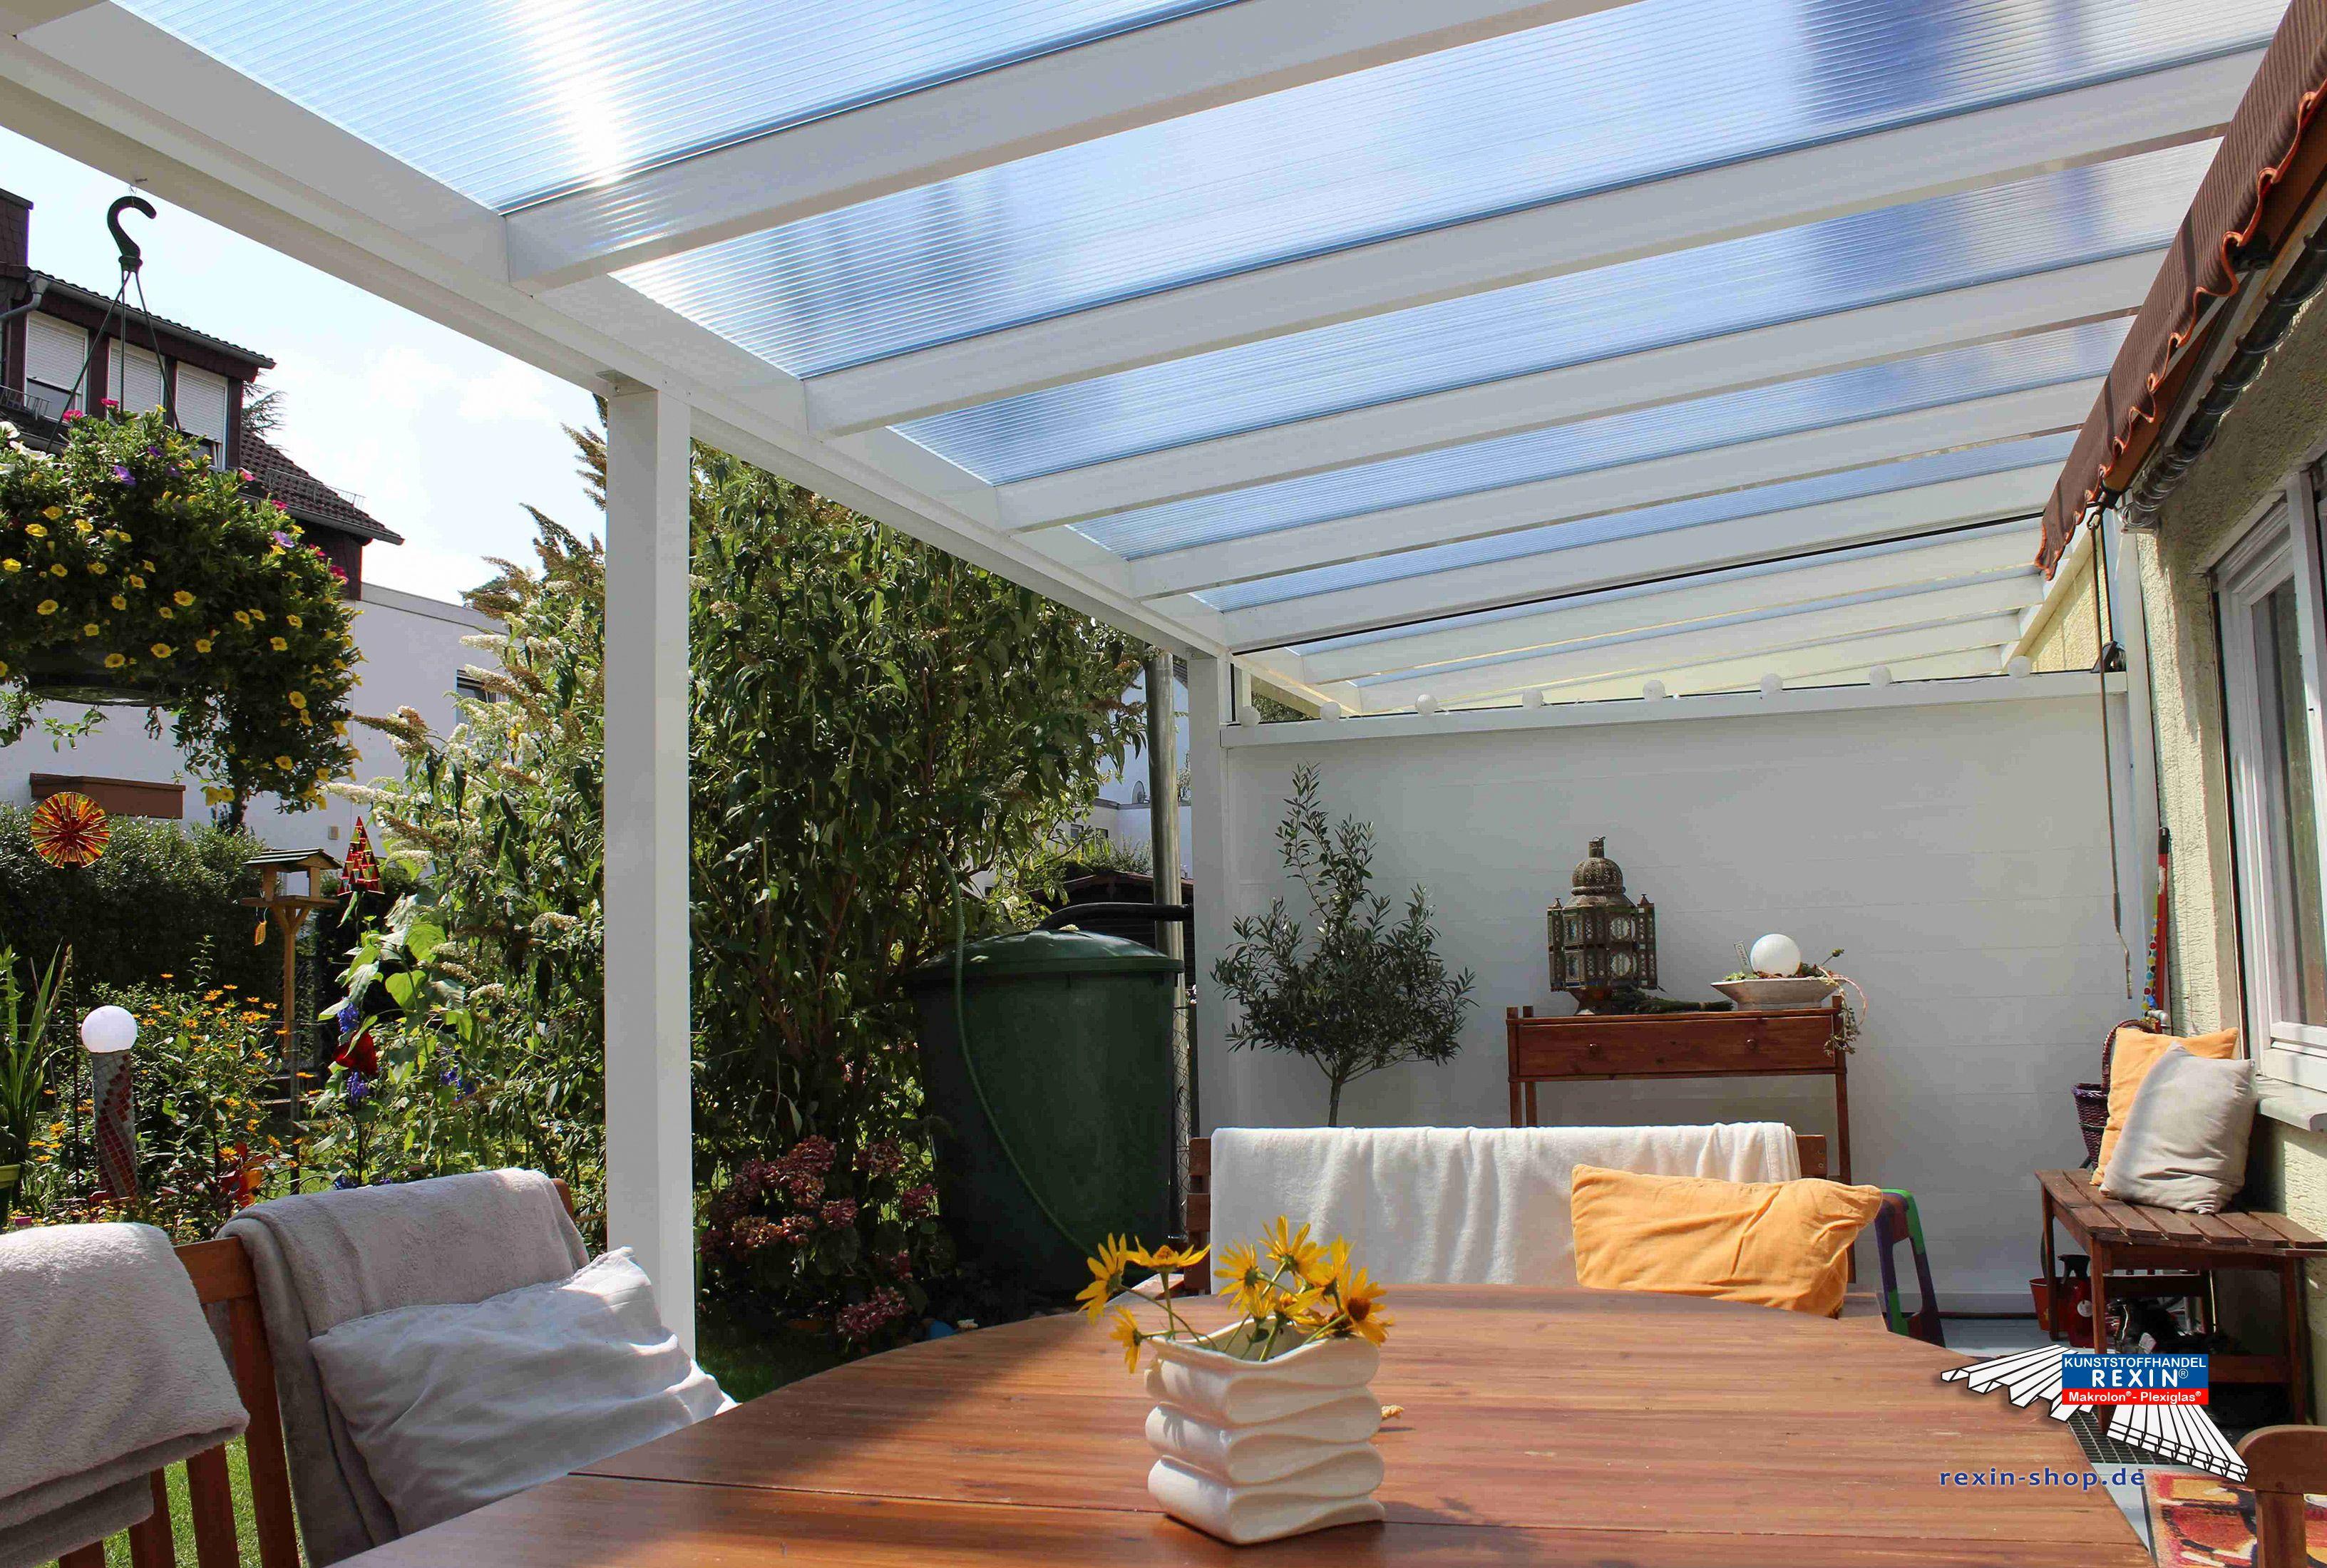 8551a495d6d03b59e01da93a807fea62 Inspiration Sichtschutz Balkon Einseitig Durchsichtig Schema